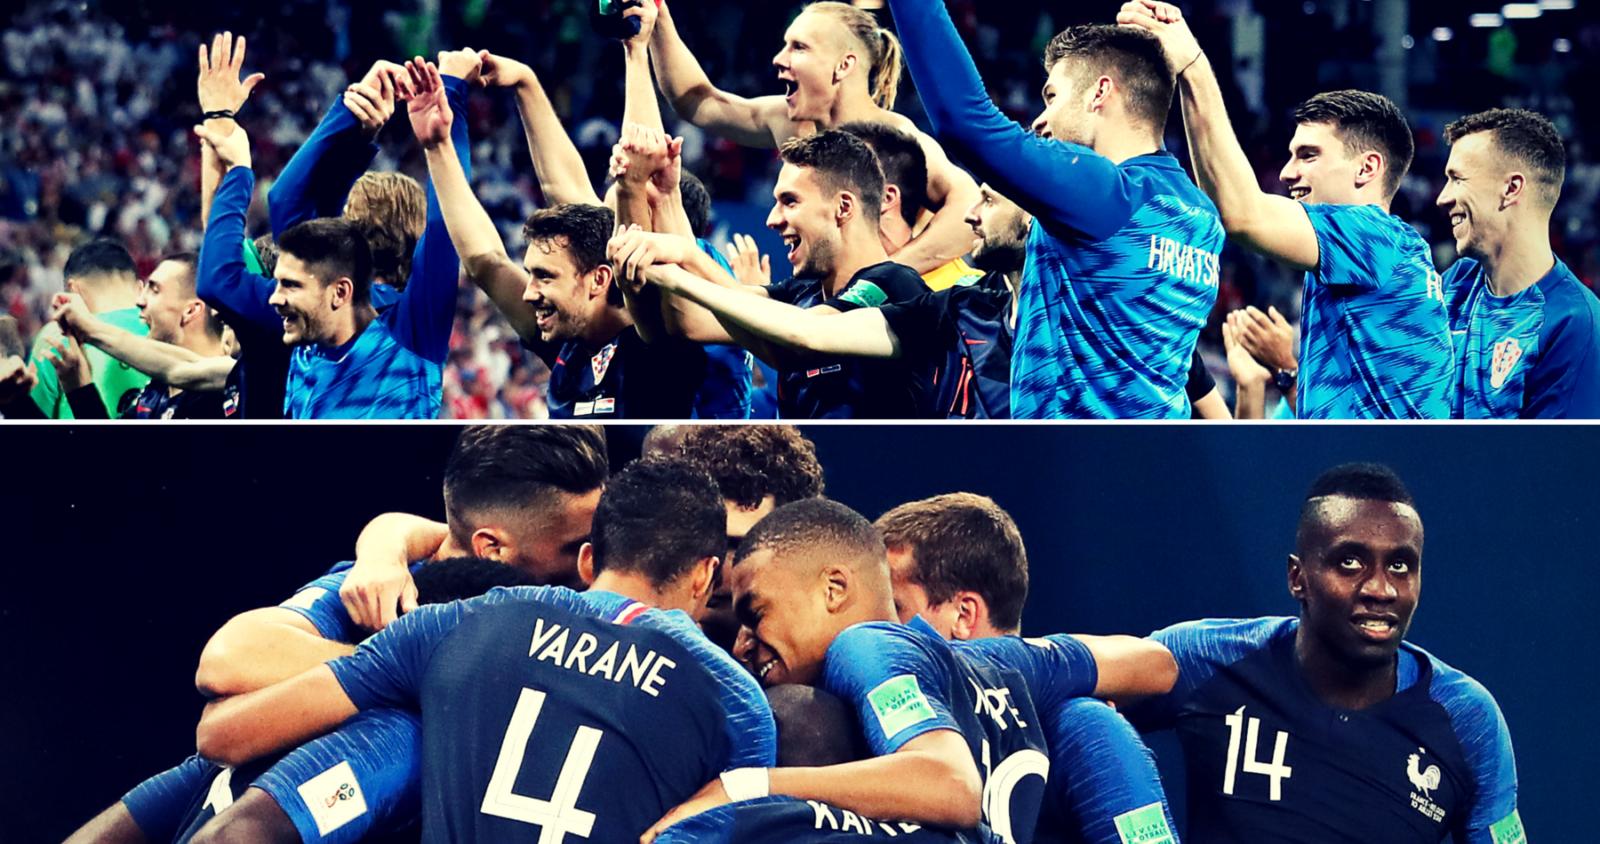 France vs Croatia: Head-to-head, stats and what history